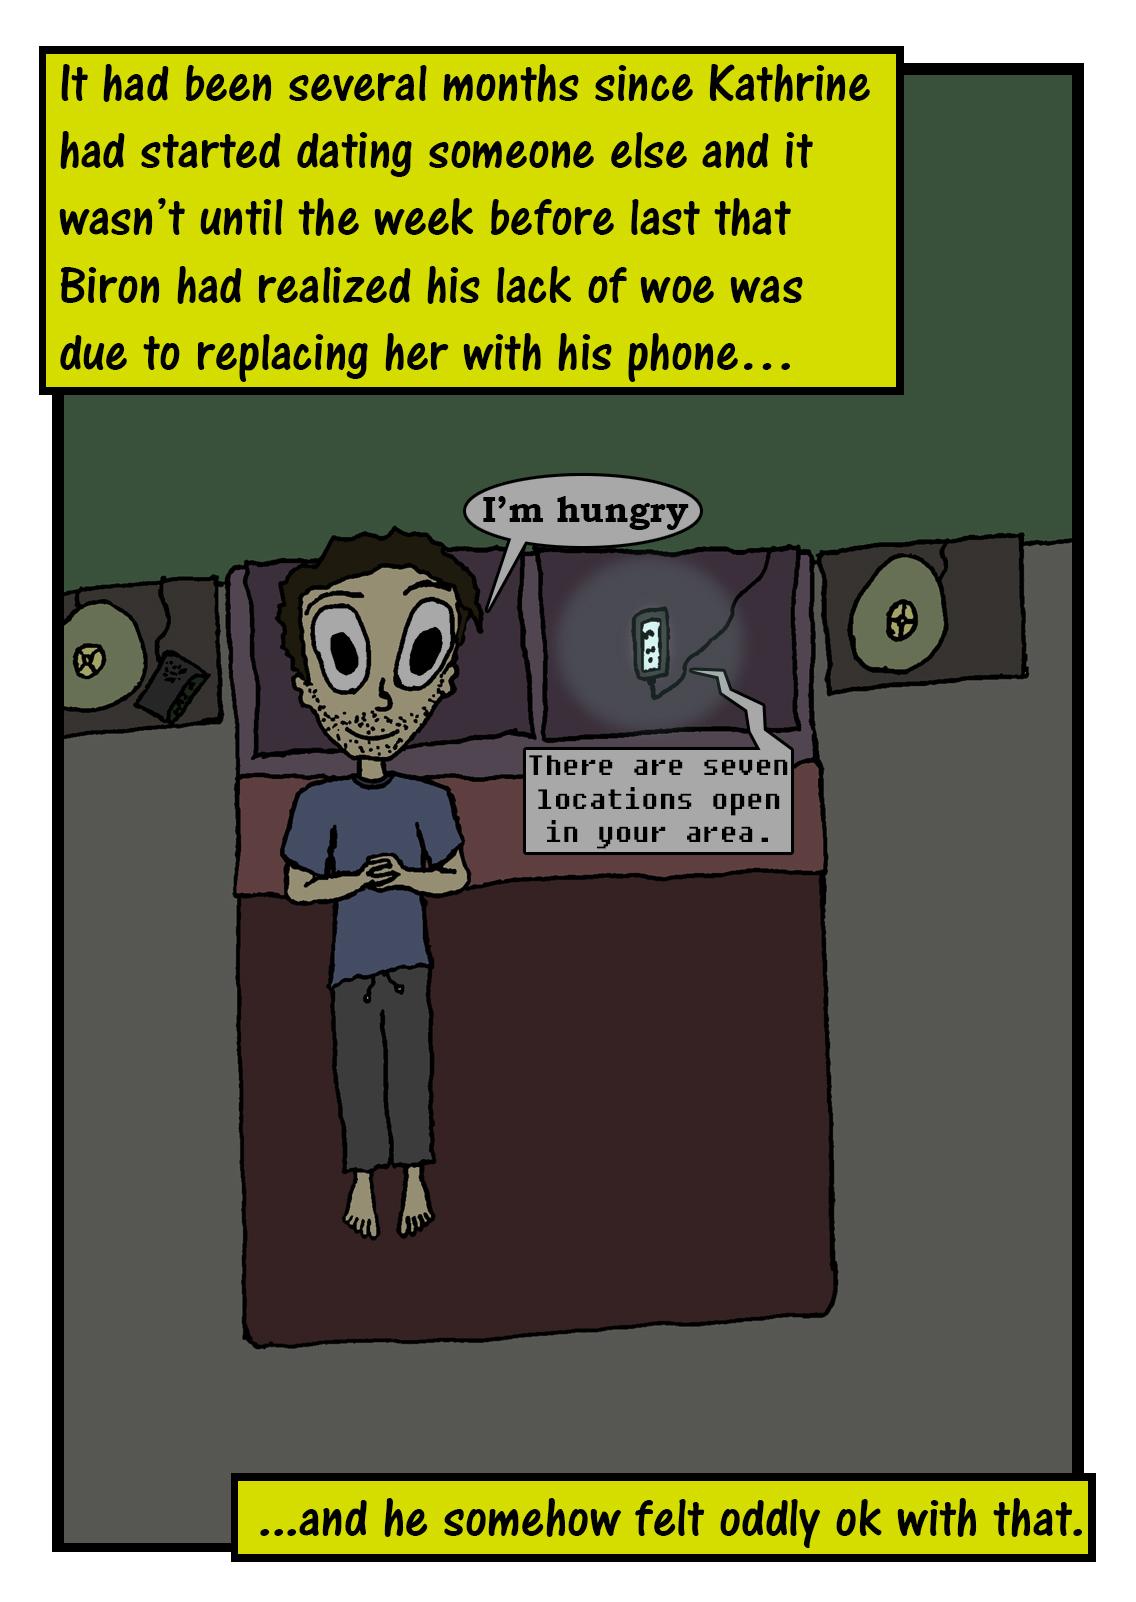 #51 Biron's Lack of Woe